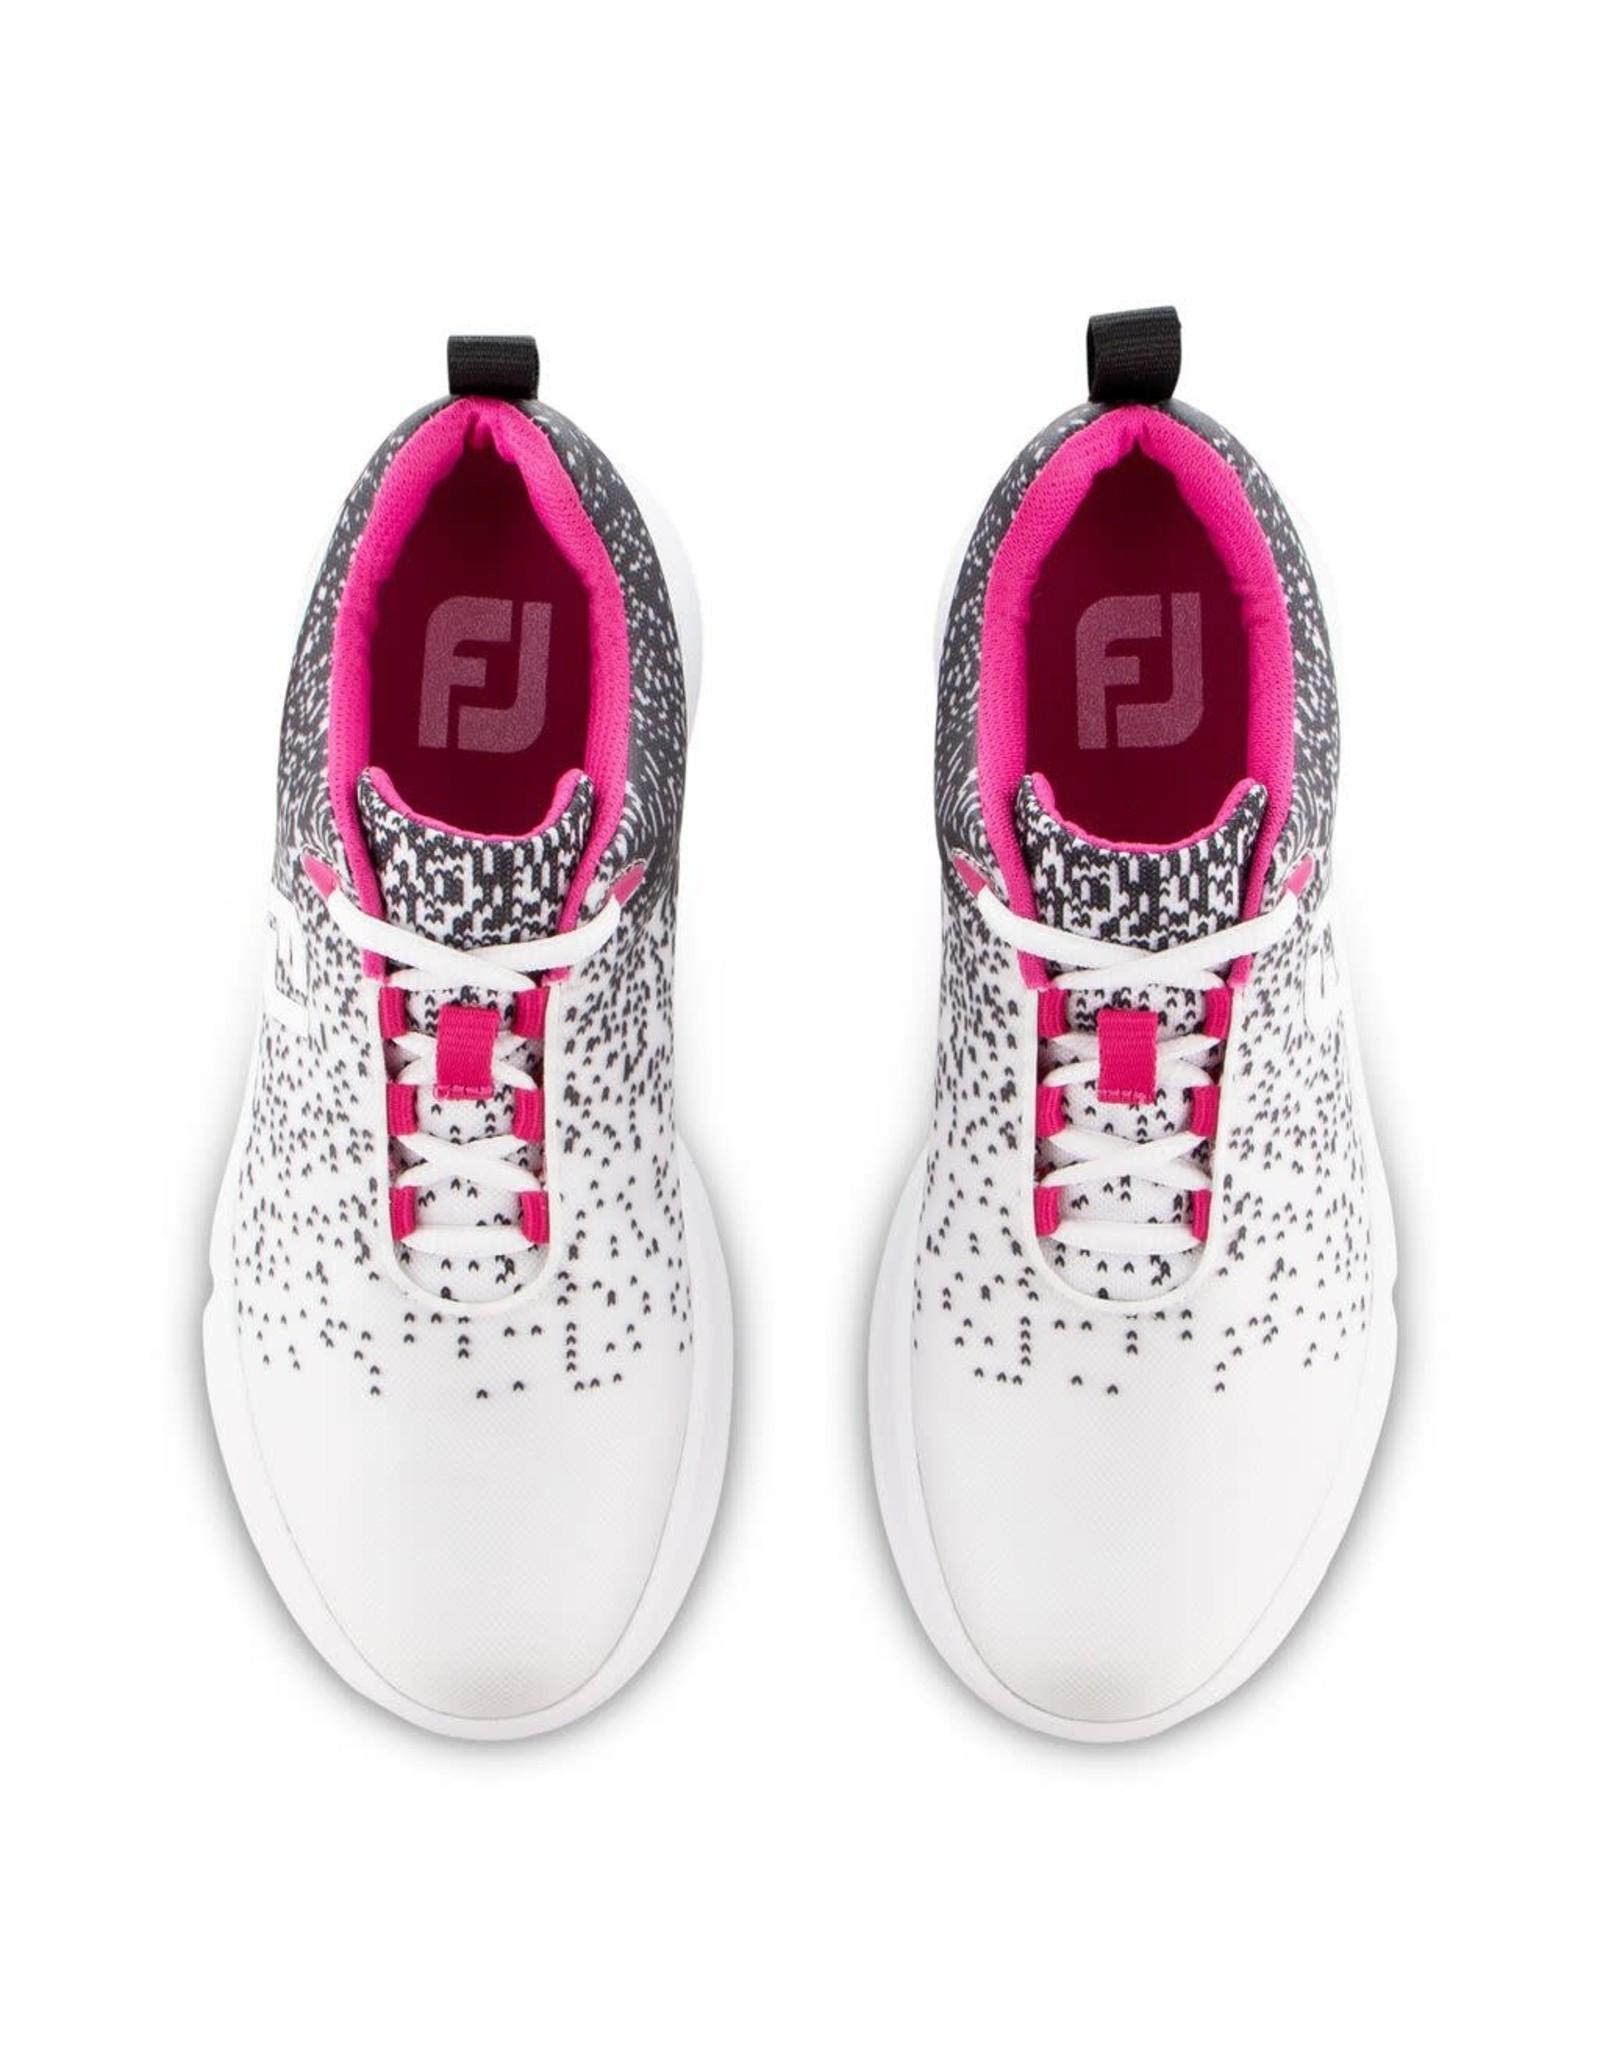 FJ FJ Leisure Women's Black/Pink